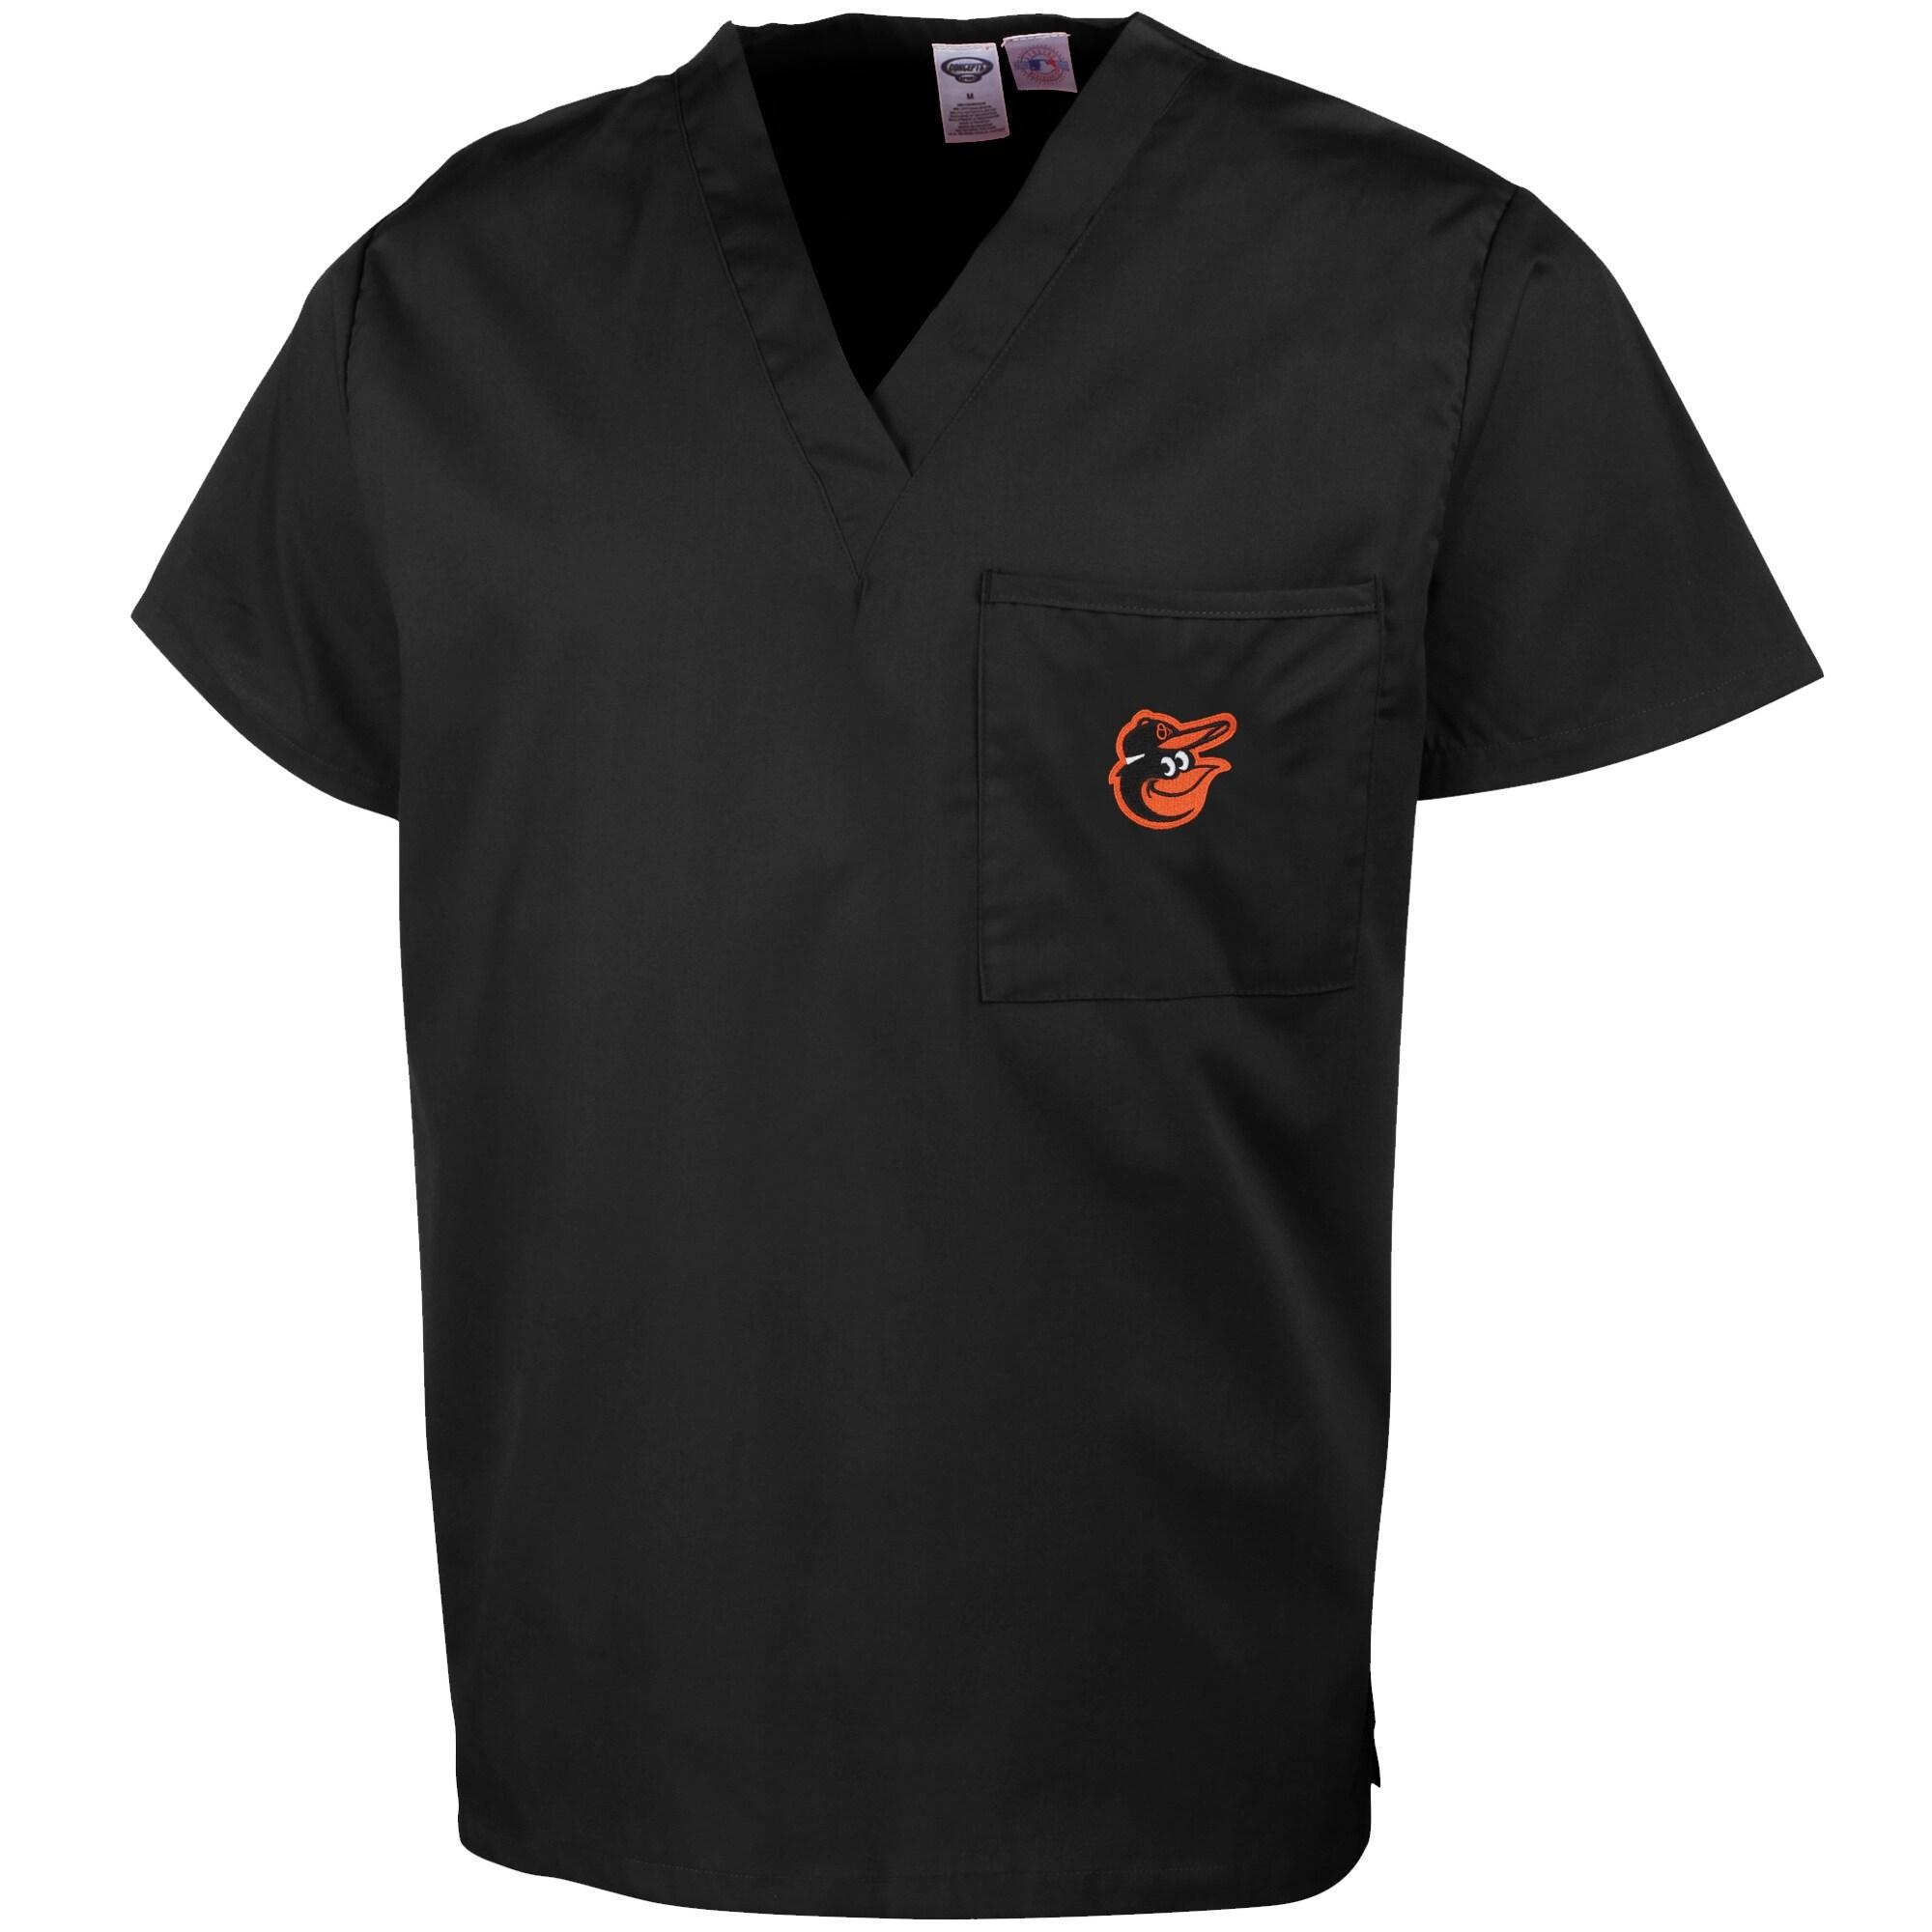 Baltimore Orioles Unisex Scrub Top - Black